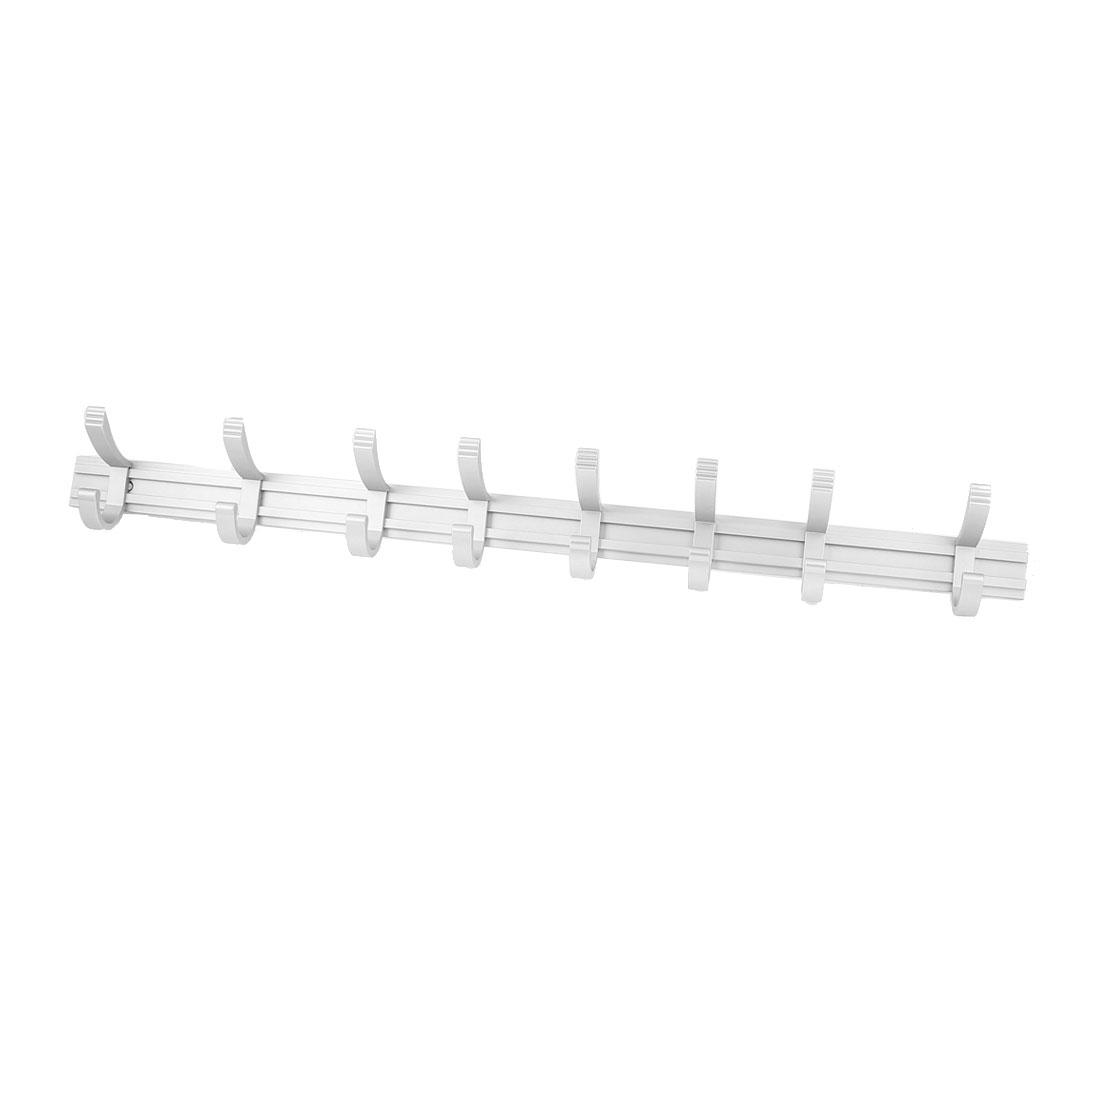 Bathroom Aluminum Wall Mount Towel Coat Hat Bag 8 Hooks Hanger Rack Silver Tone